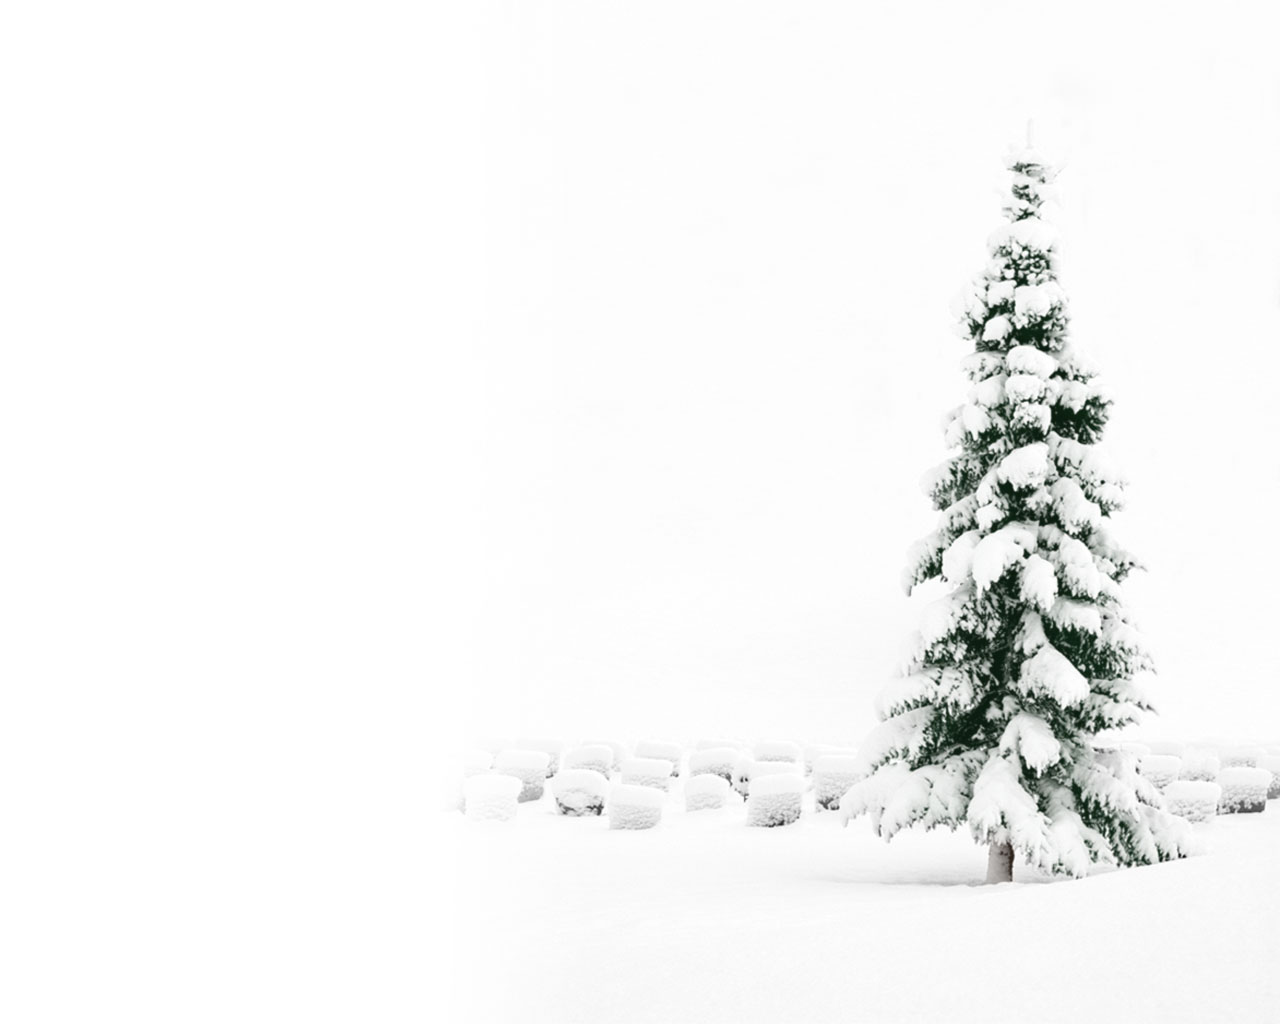 Christmas Tree Wallpapers 22874 1280x1024 Px Hdwallsource Com